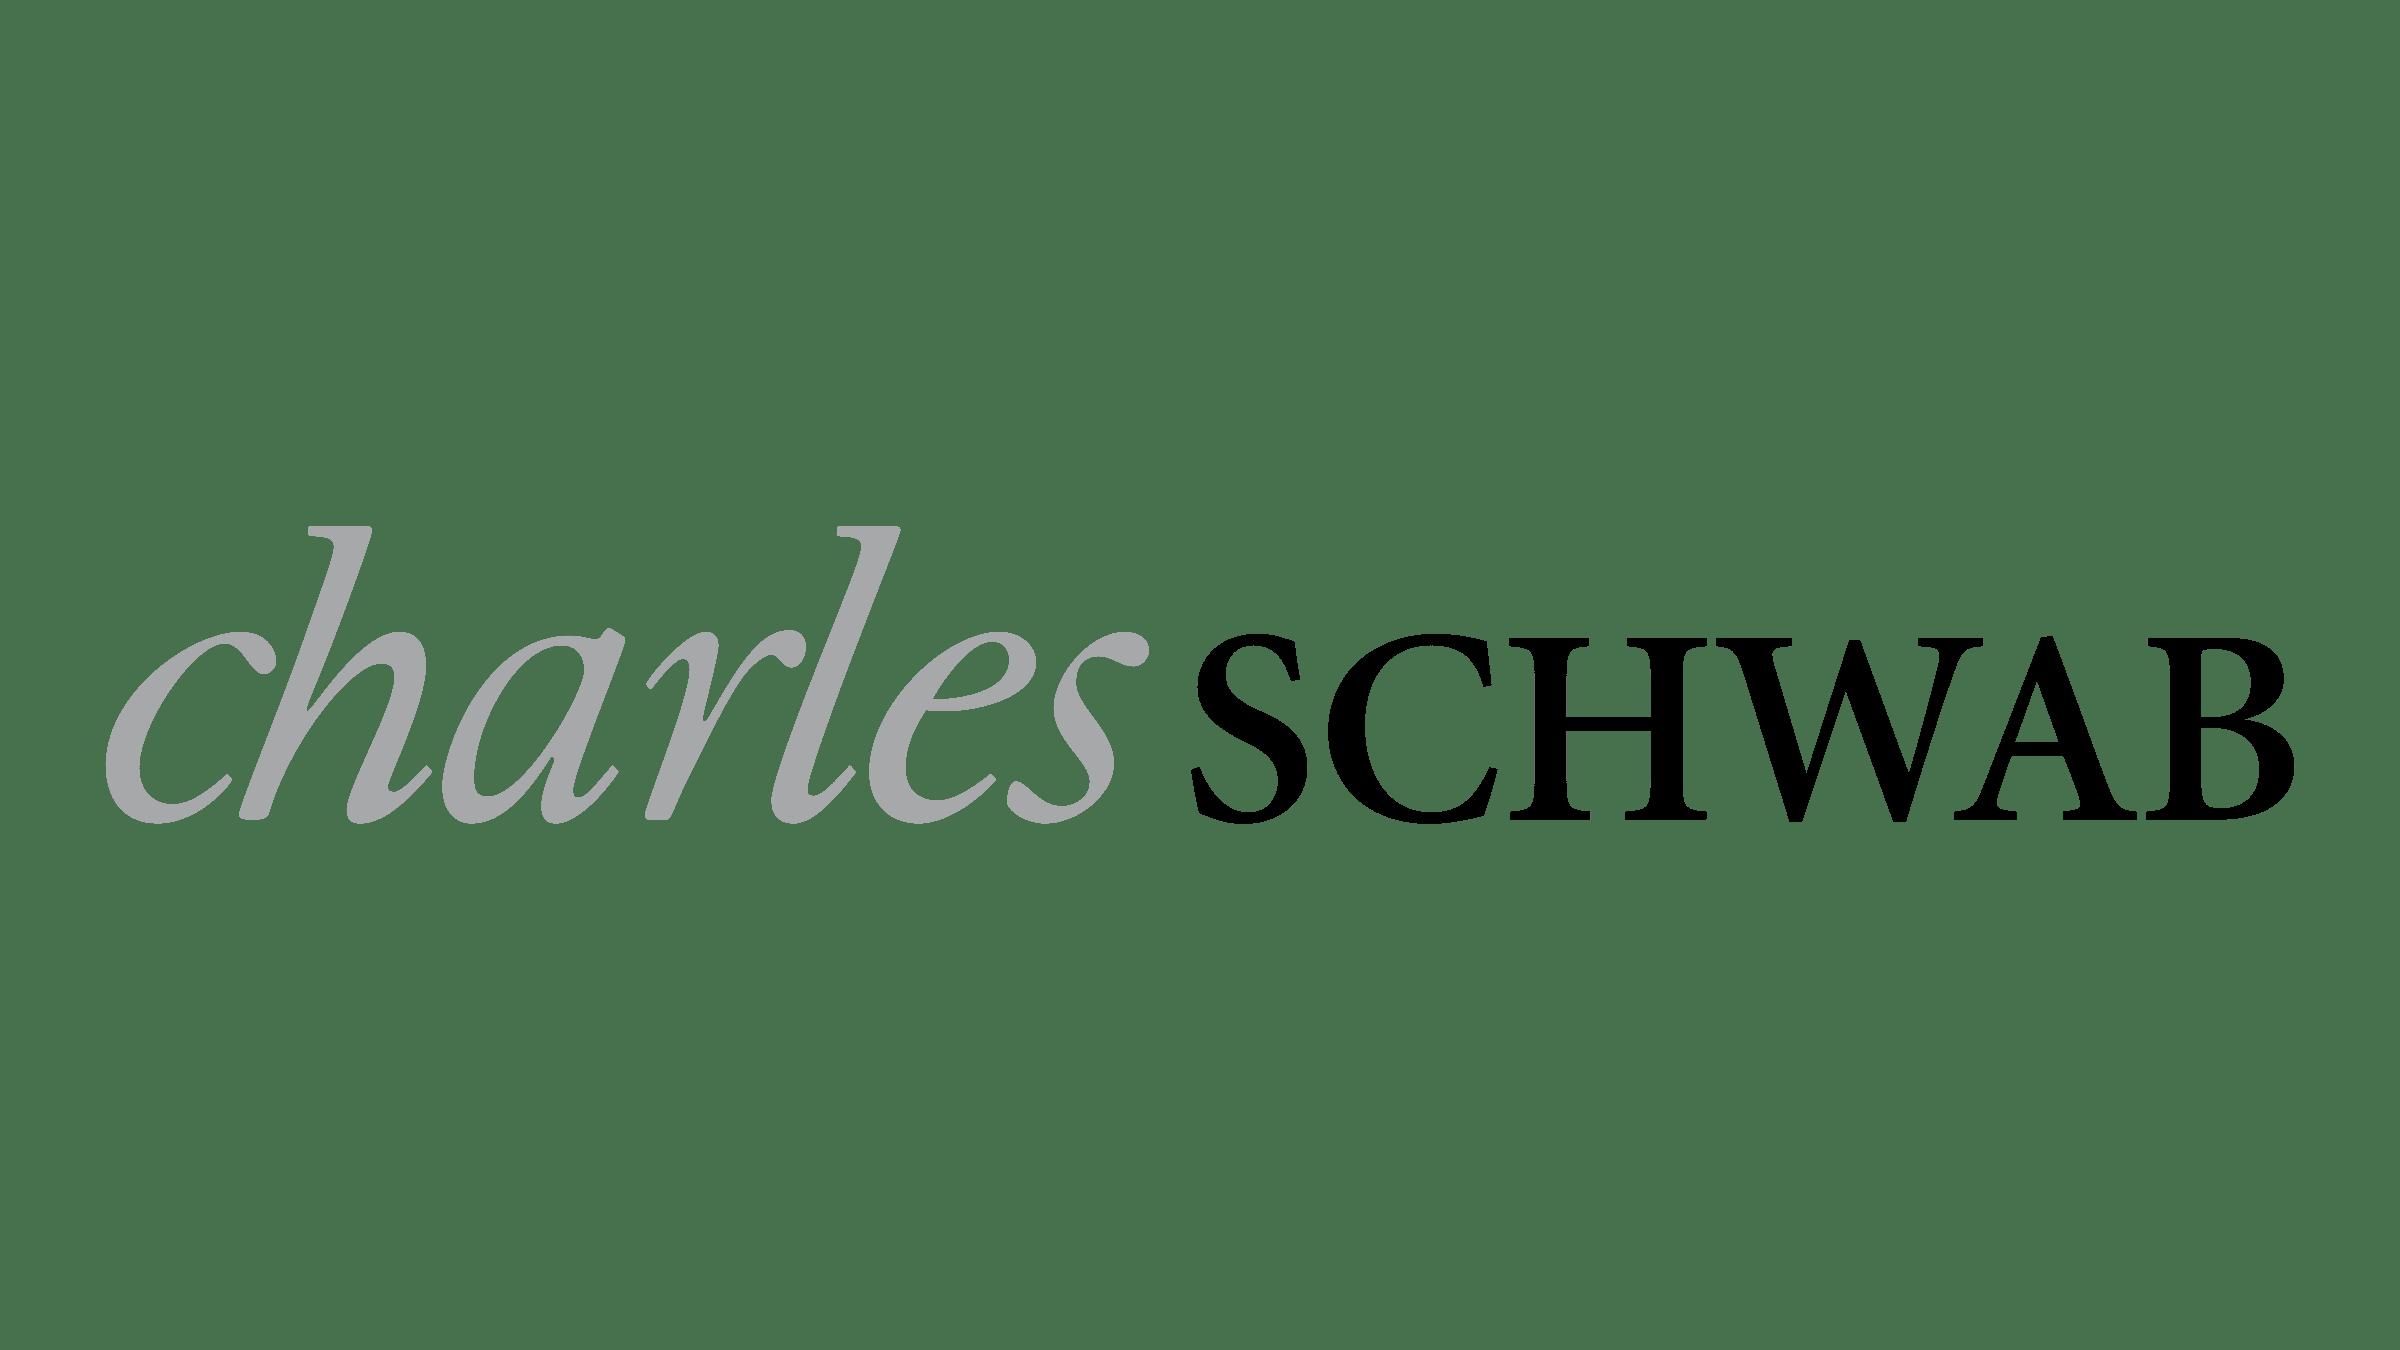 Charles Schwab Canton, MI OnTrack Wealth Management